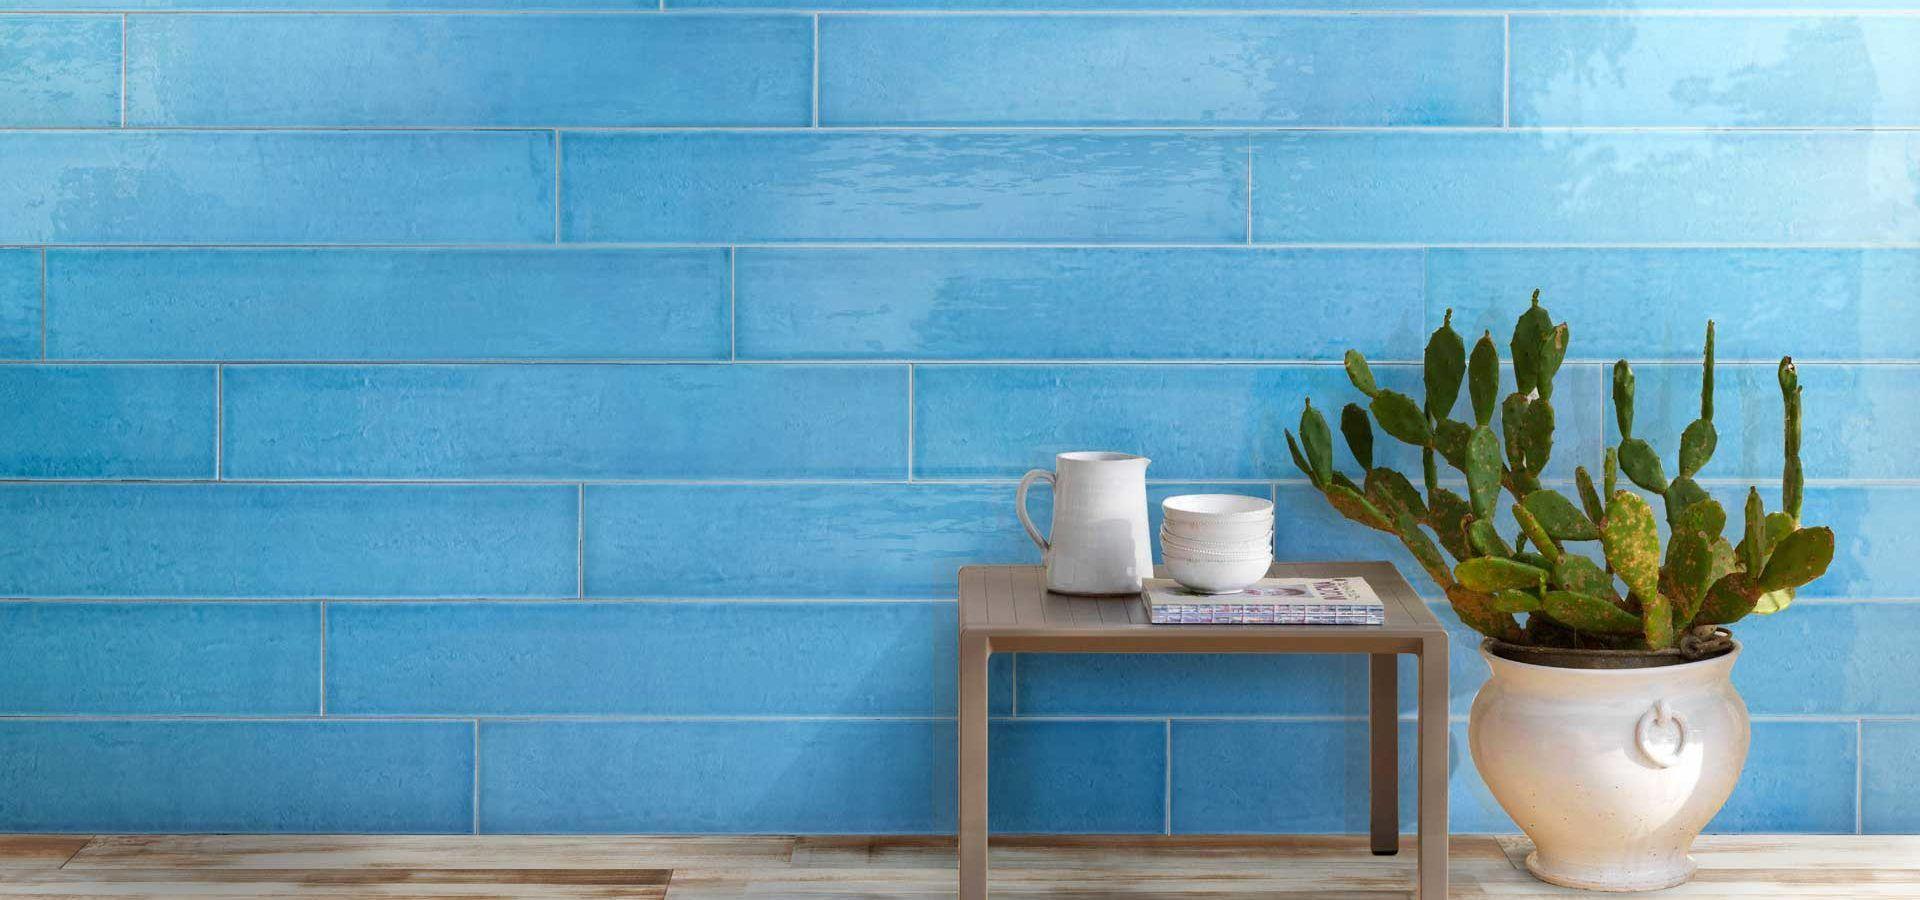 "Rivestimento / Wall: W1065 Nettuno Cm 20x120 - 8""x48"" Pavimento / Floor: J4601 Canvas Terra Cm 20x120 - 8""x48"""